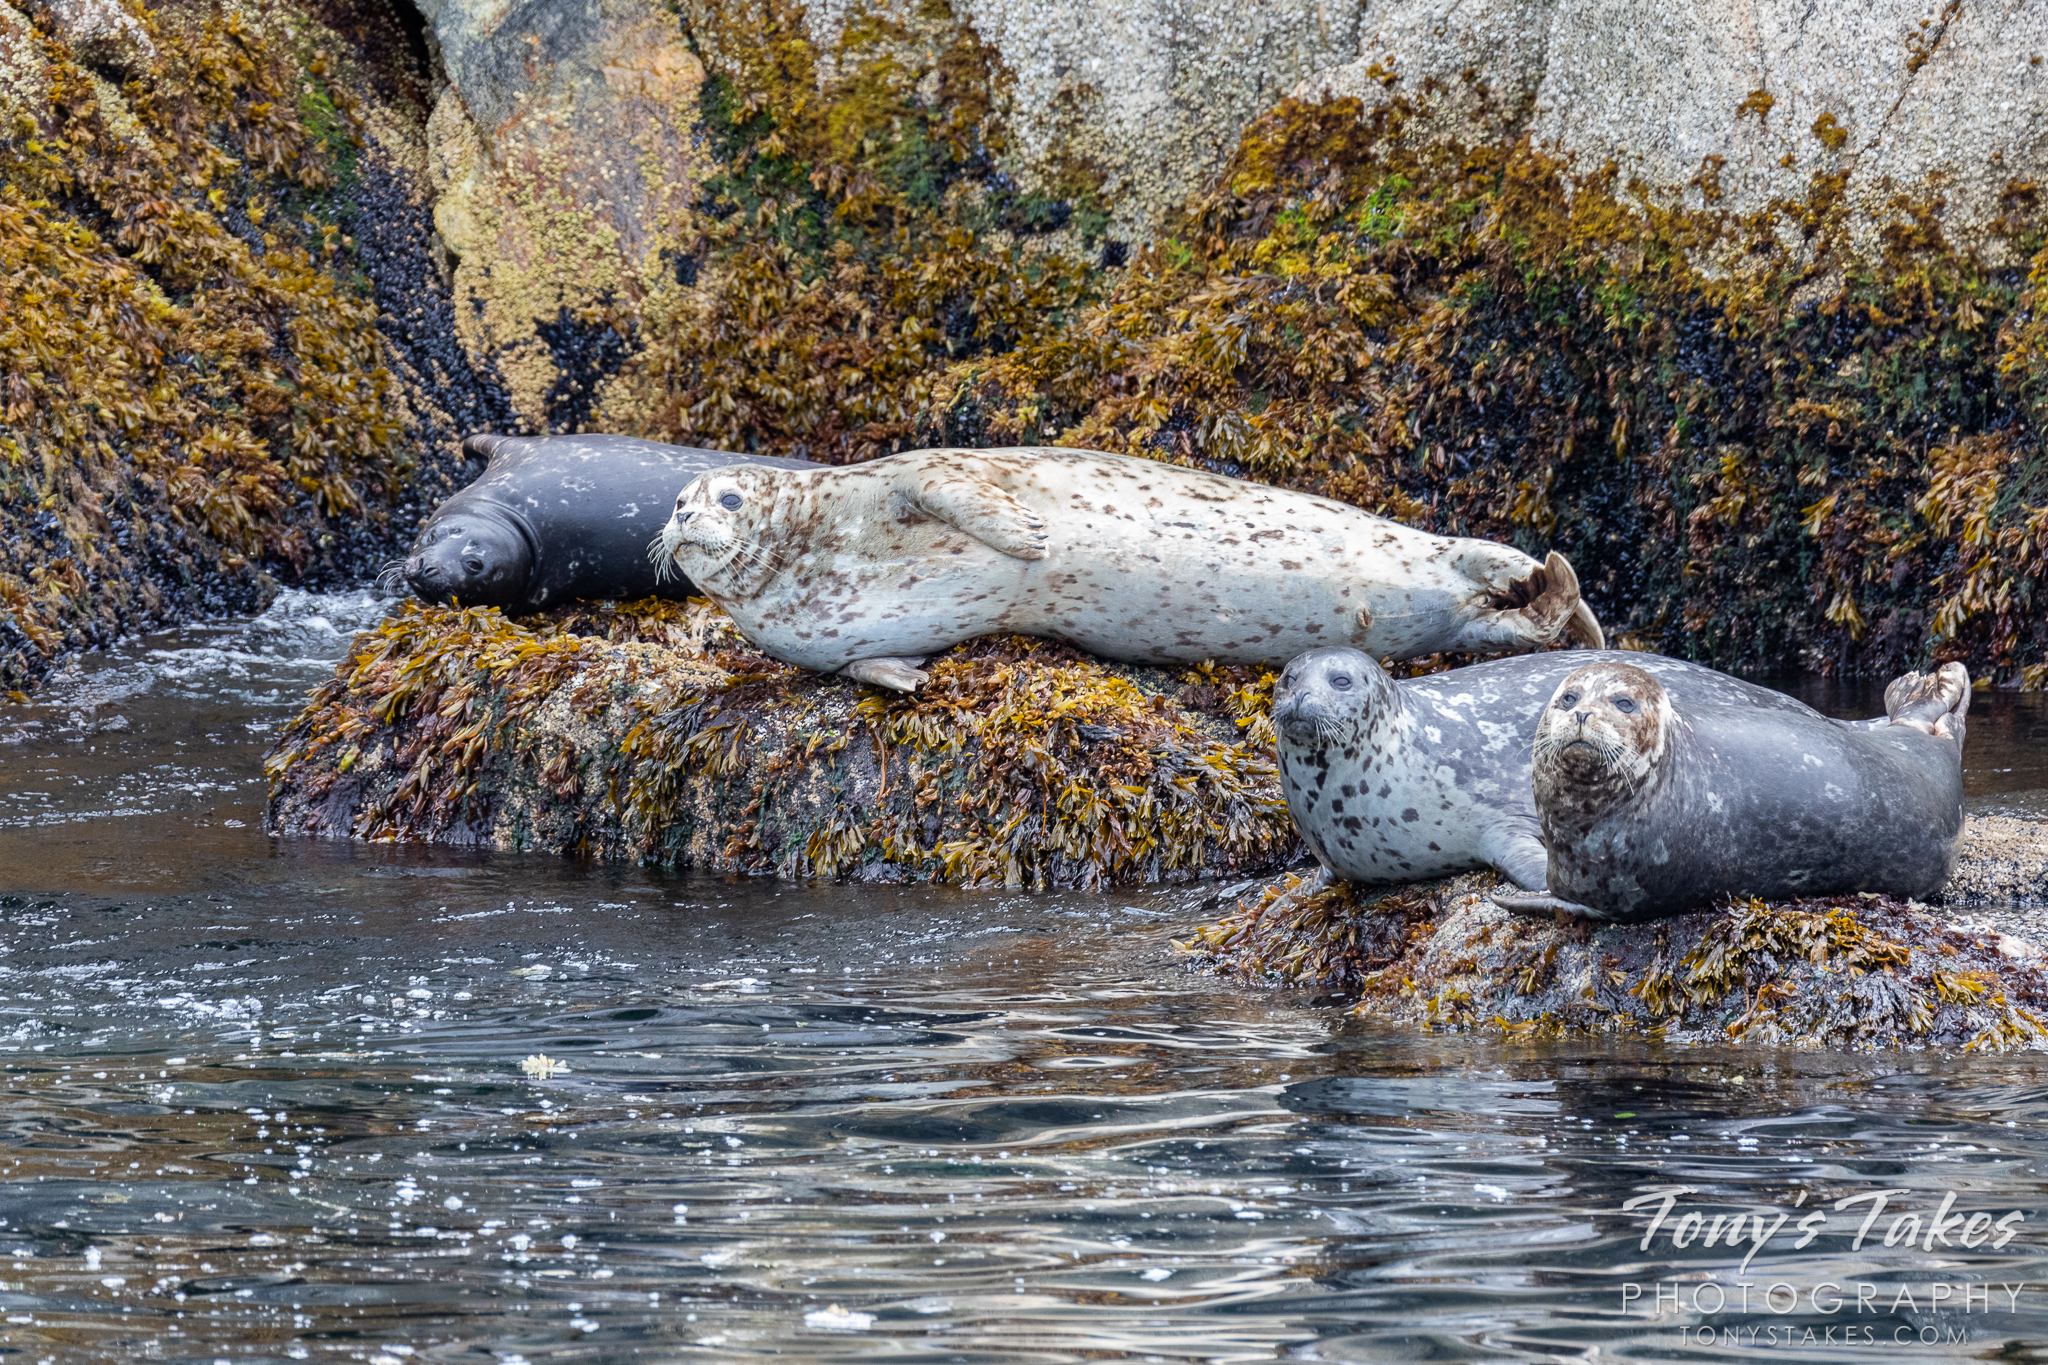 Sea lions enjoy a lazy day on the rocks